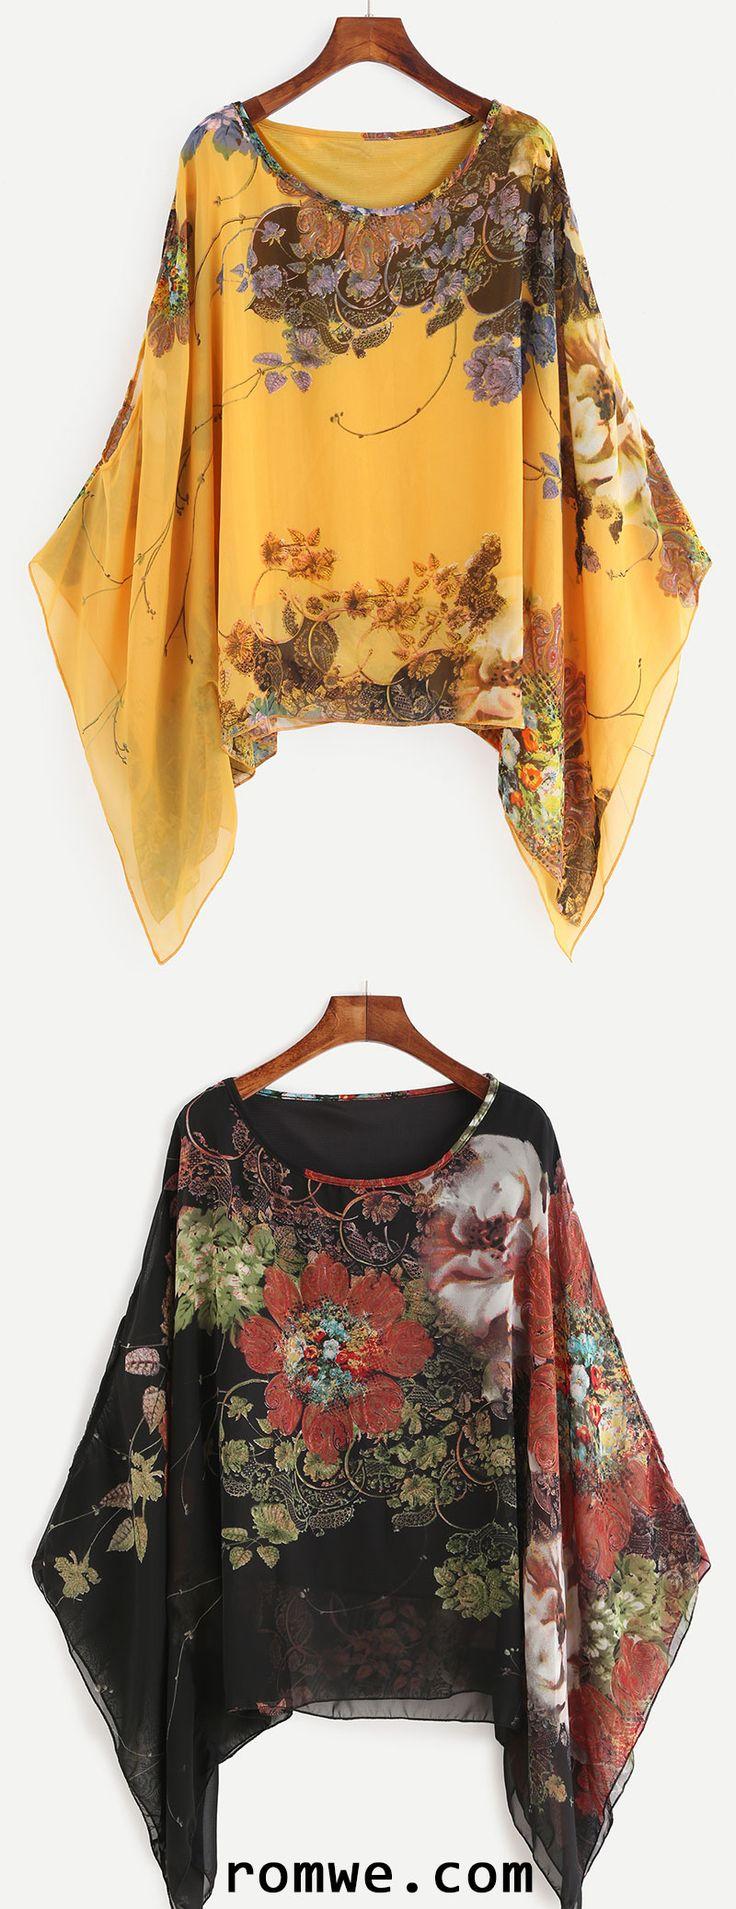 Floral Print Batwing Chiffon Blouse